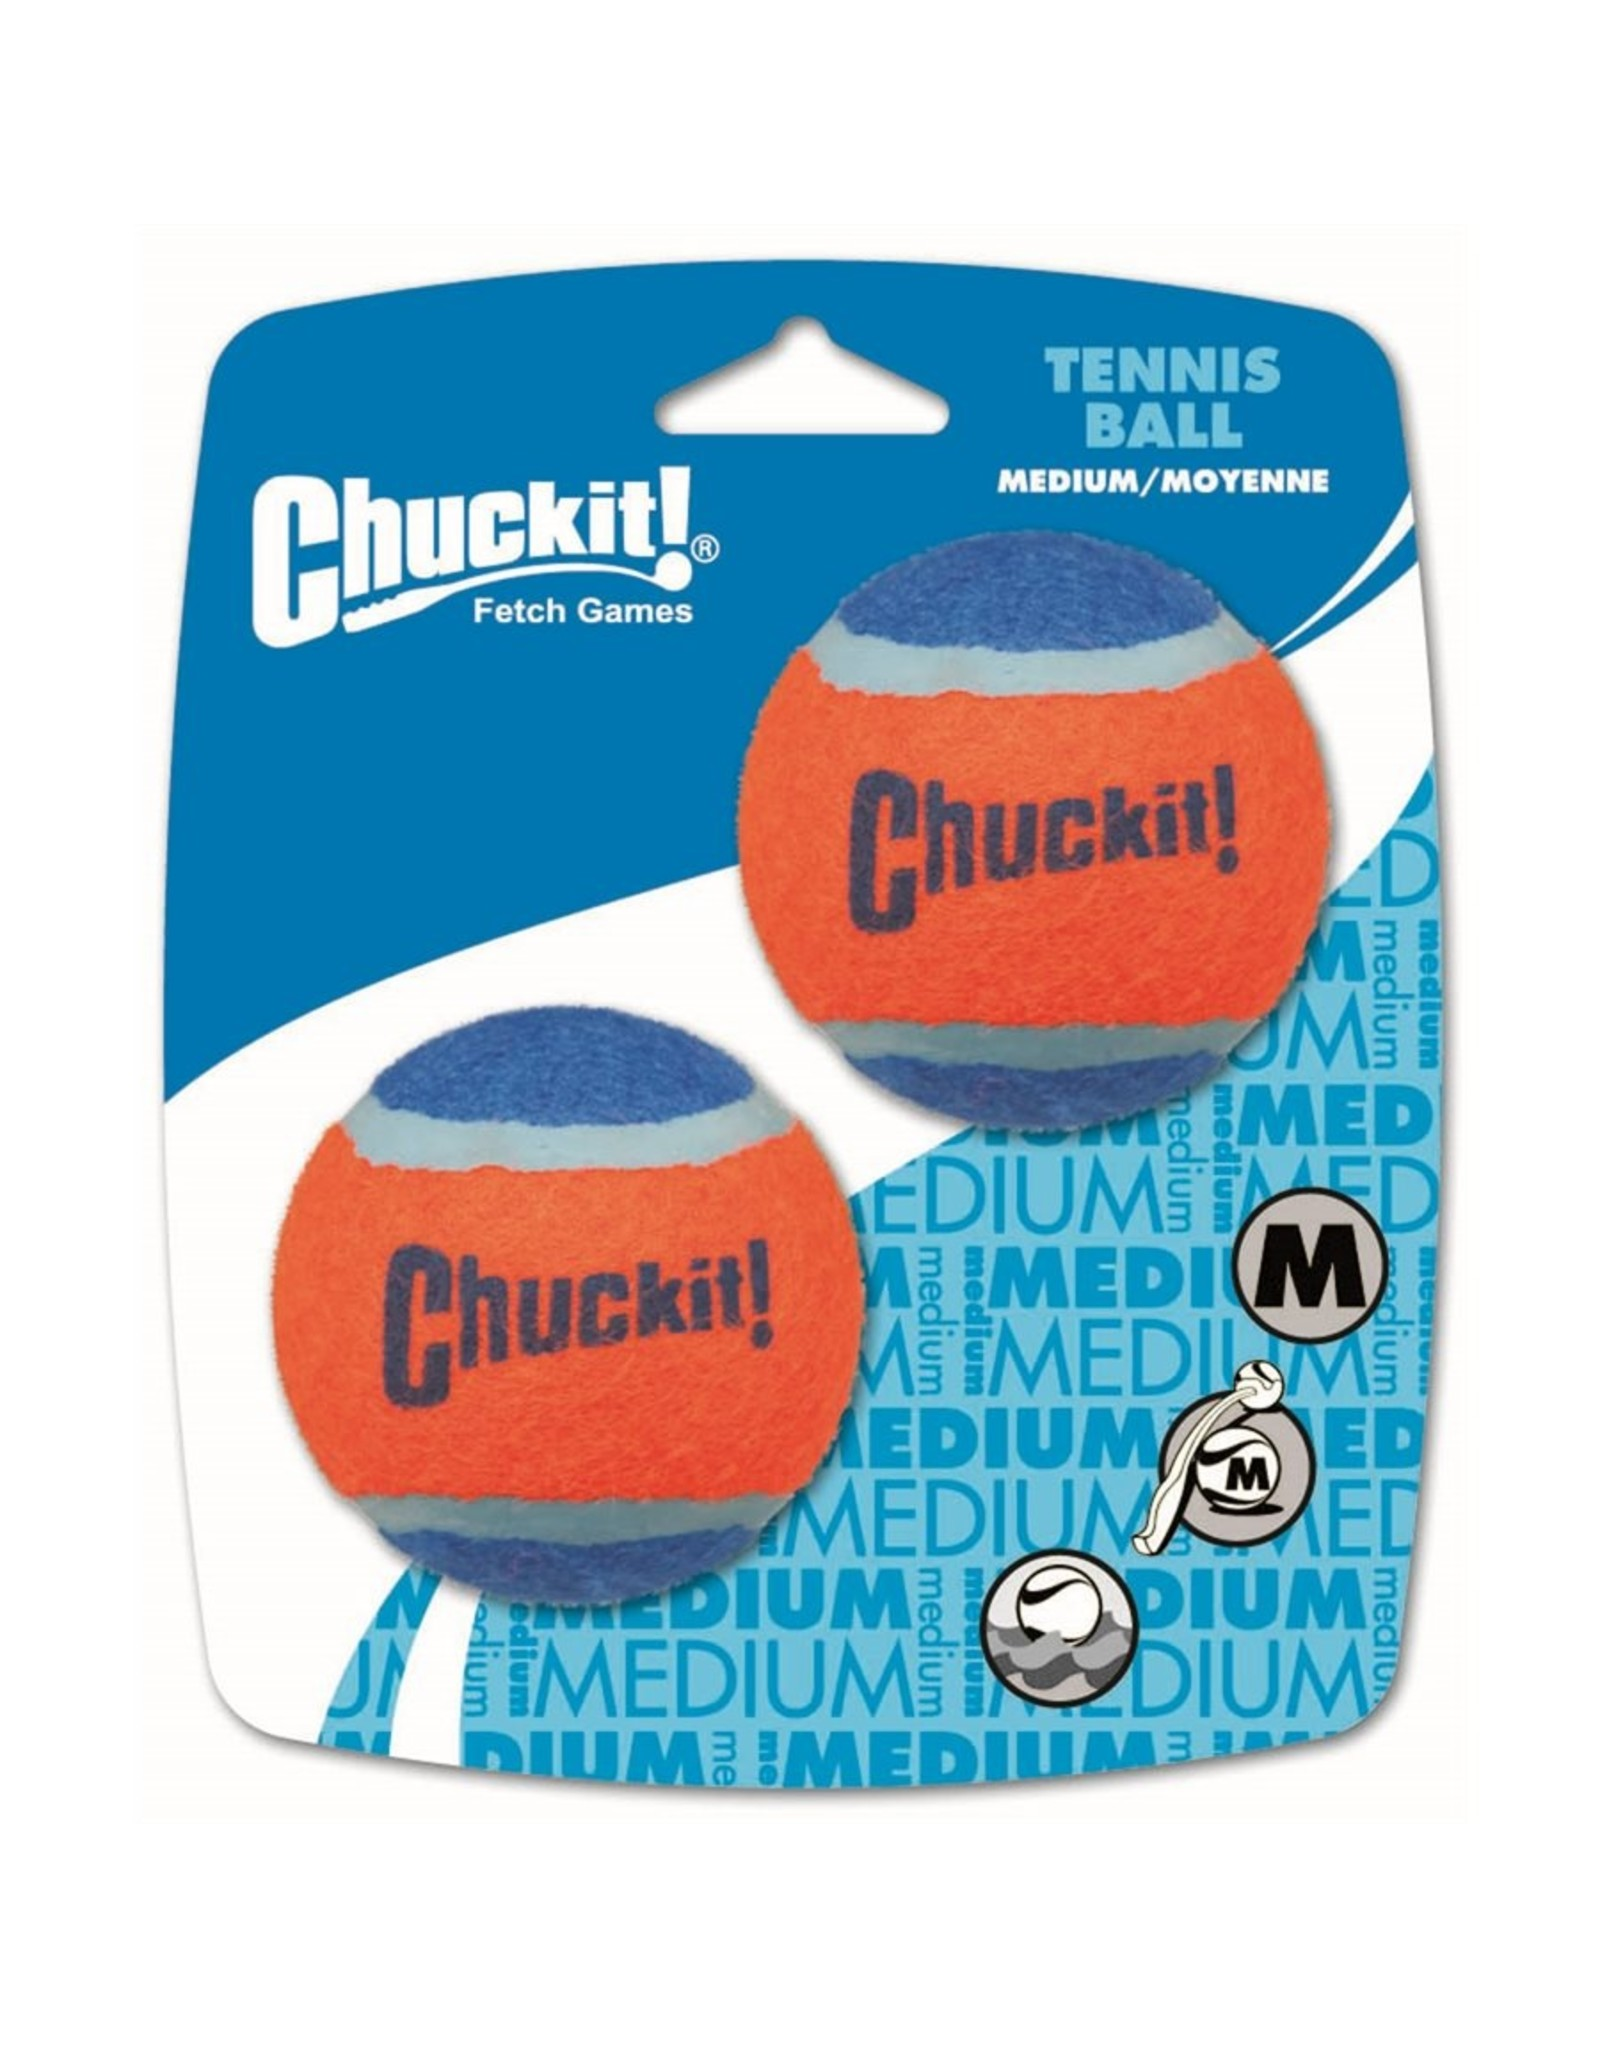 Chuckit! Tennis Balls 2-Pack Medium